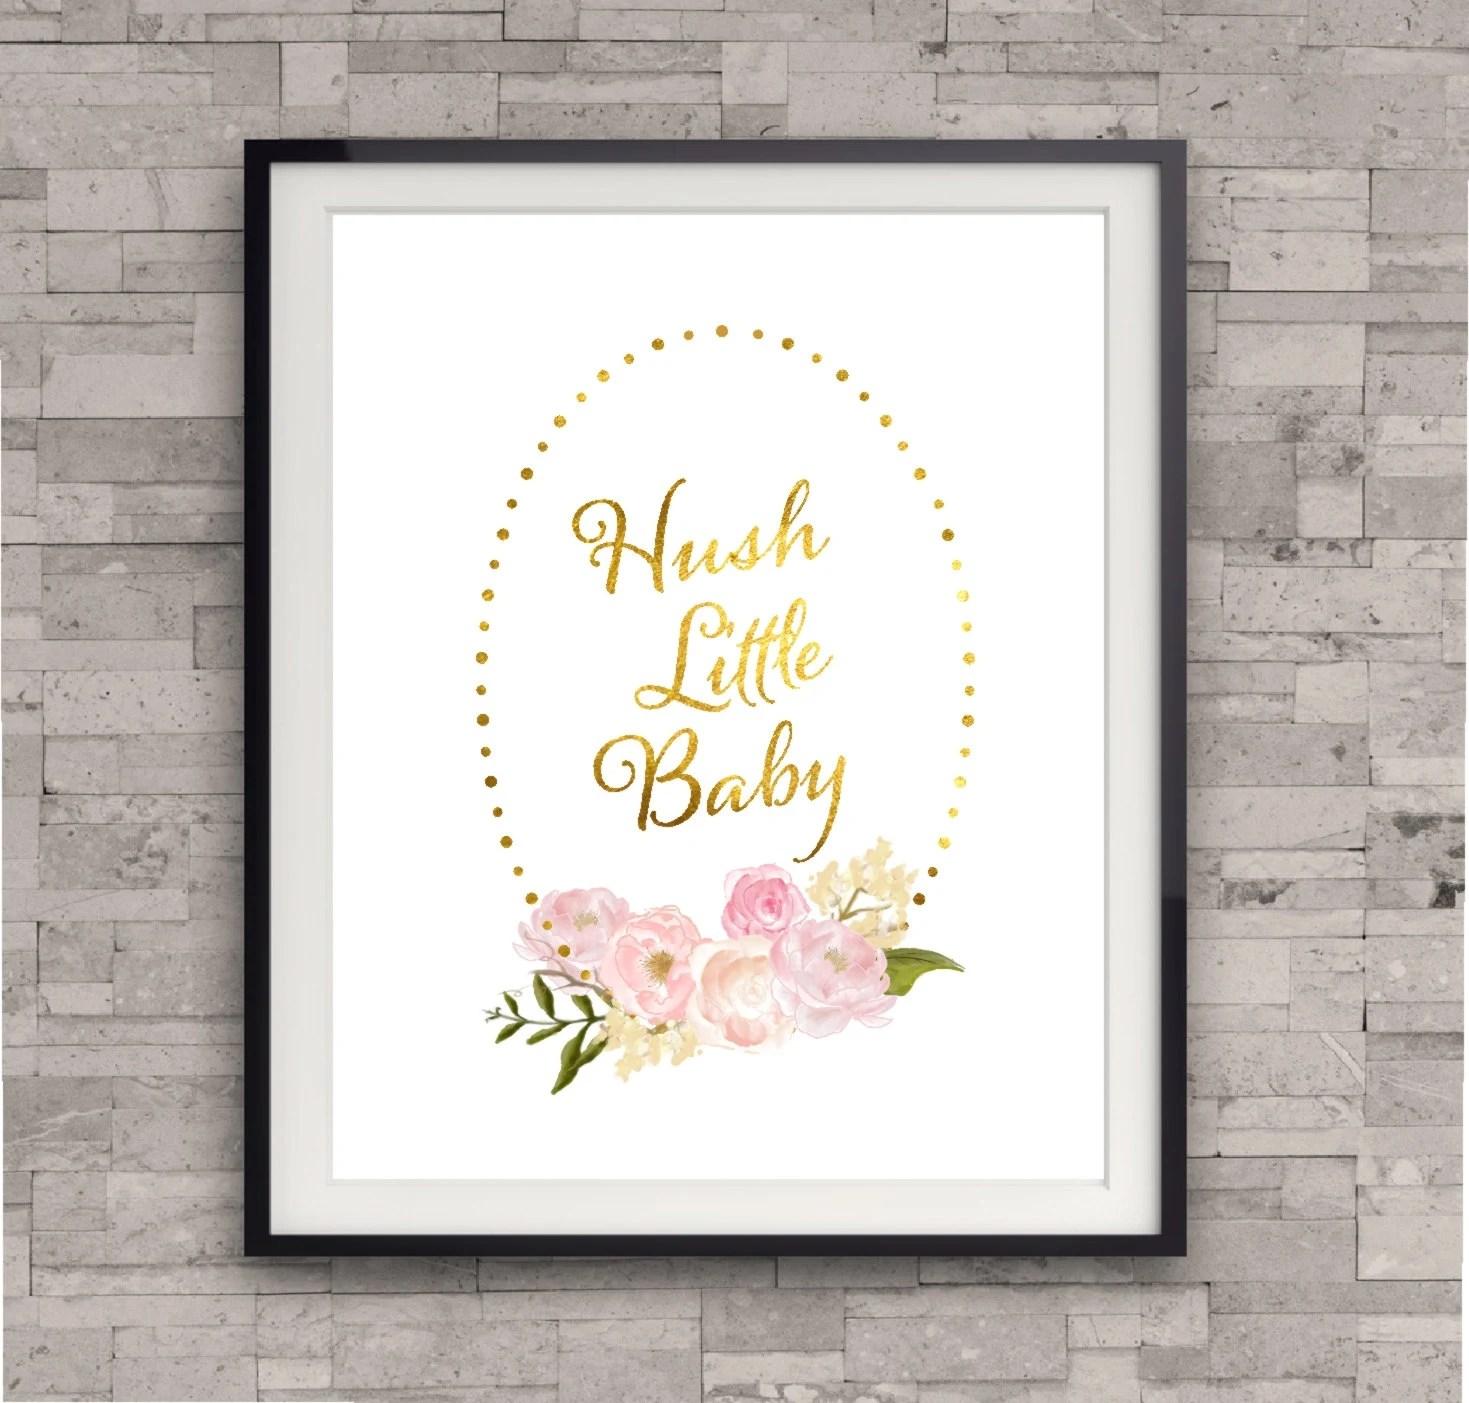 Gold Nursery Decor Hush Little Baby Lullaby Art Print